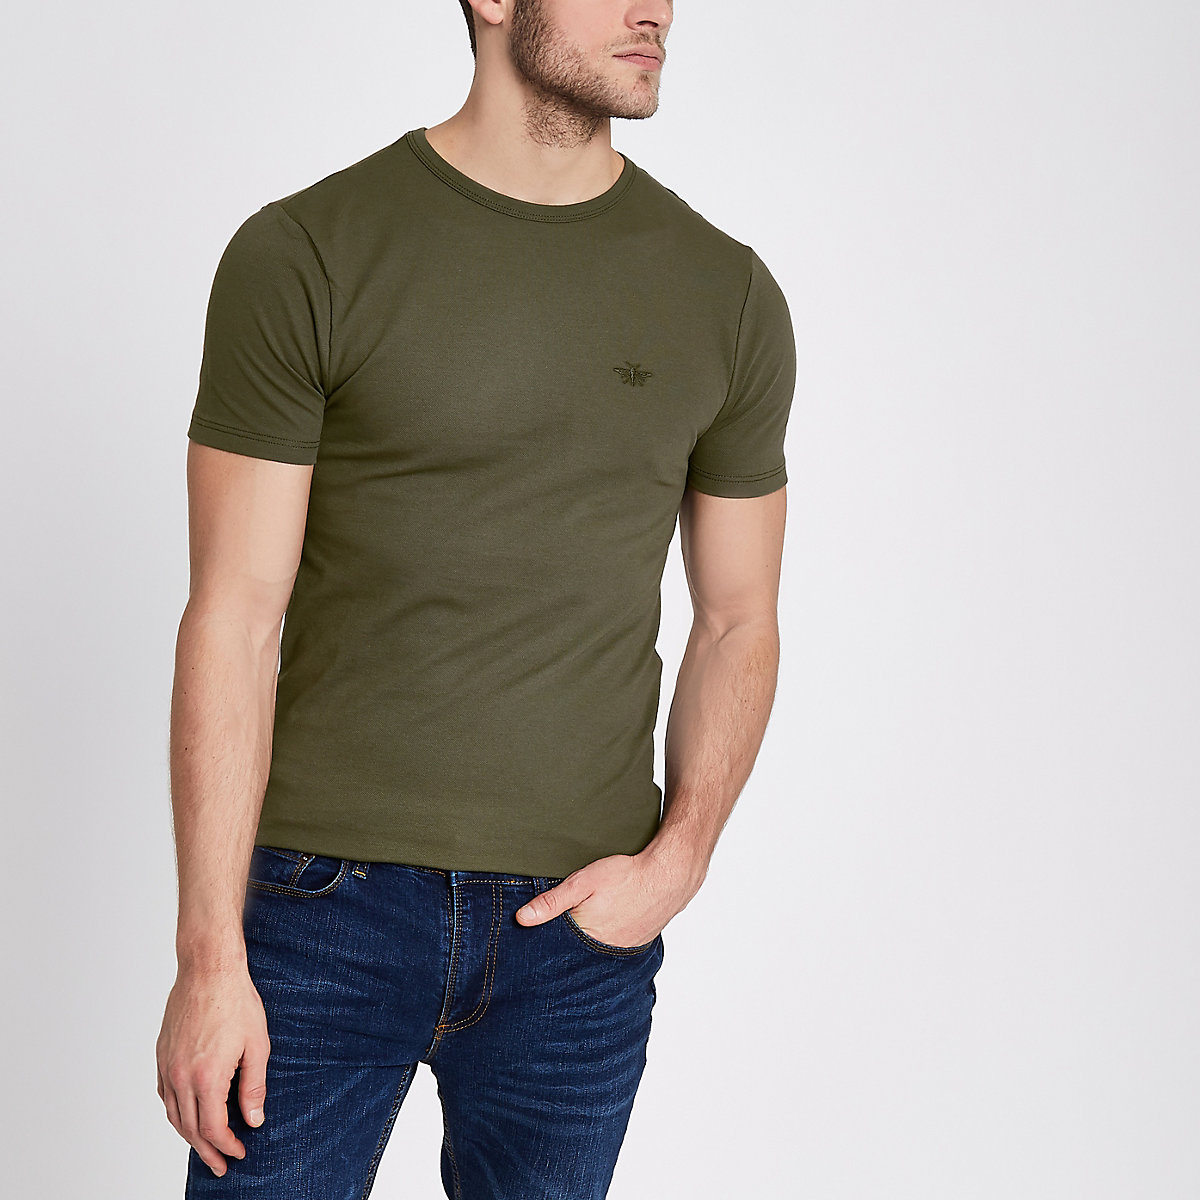 Khaki green pique muscle fit T-shirt